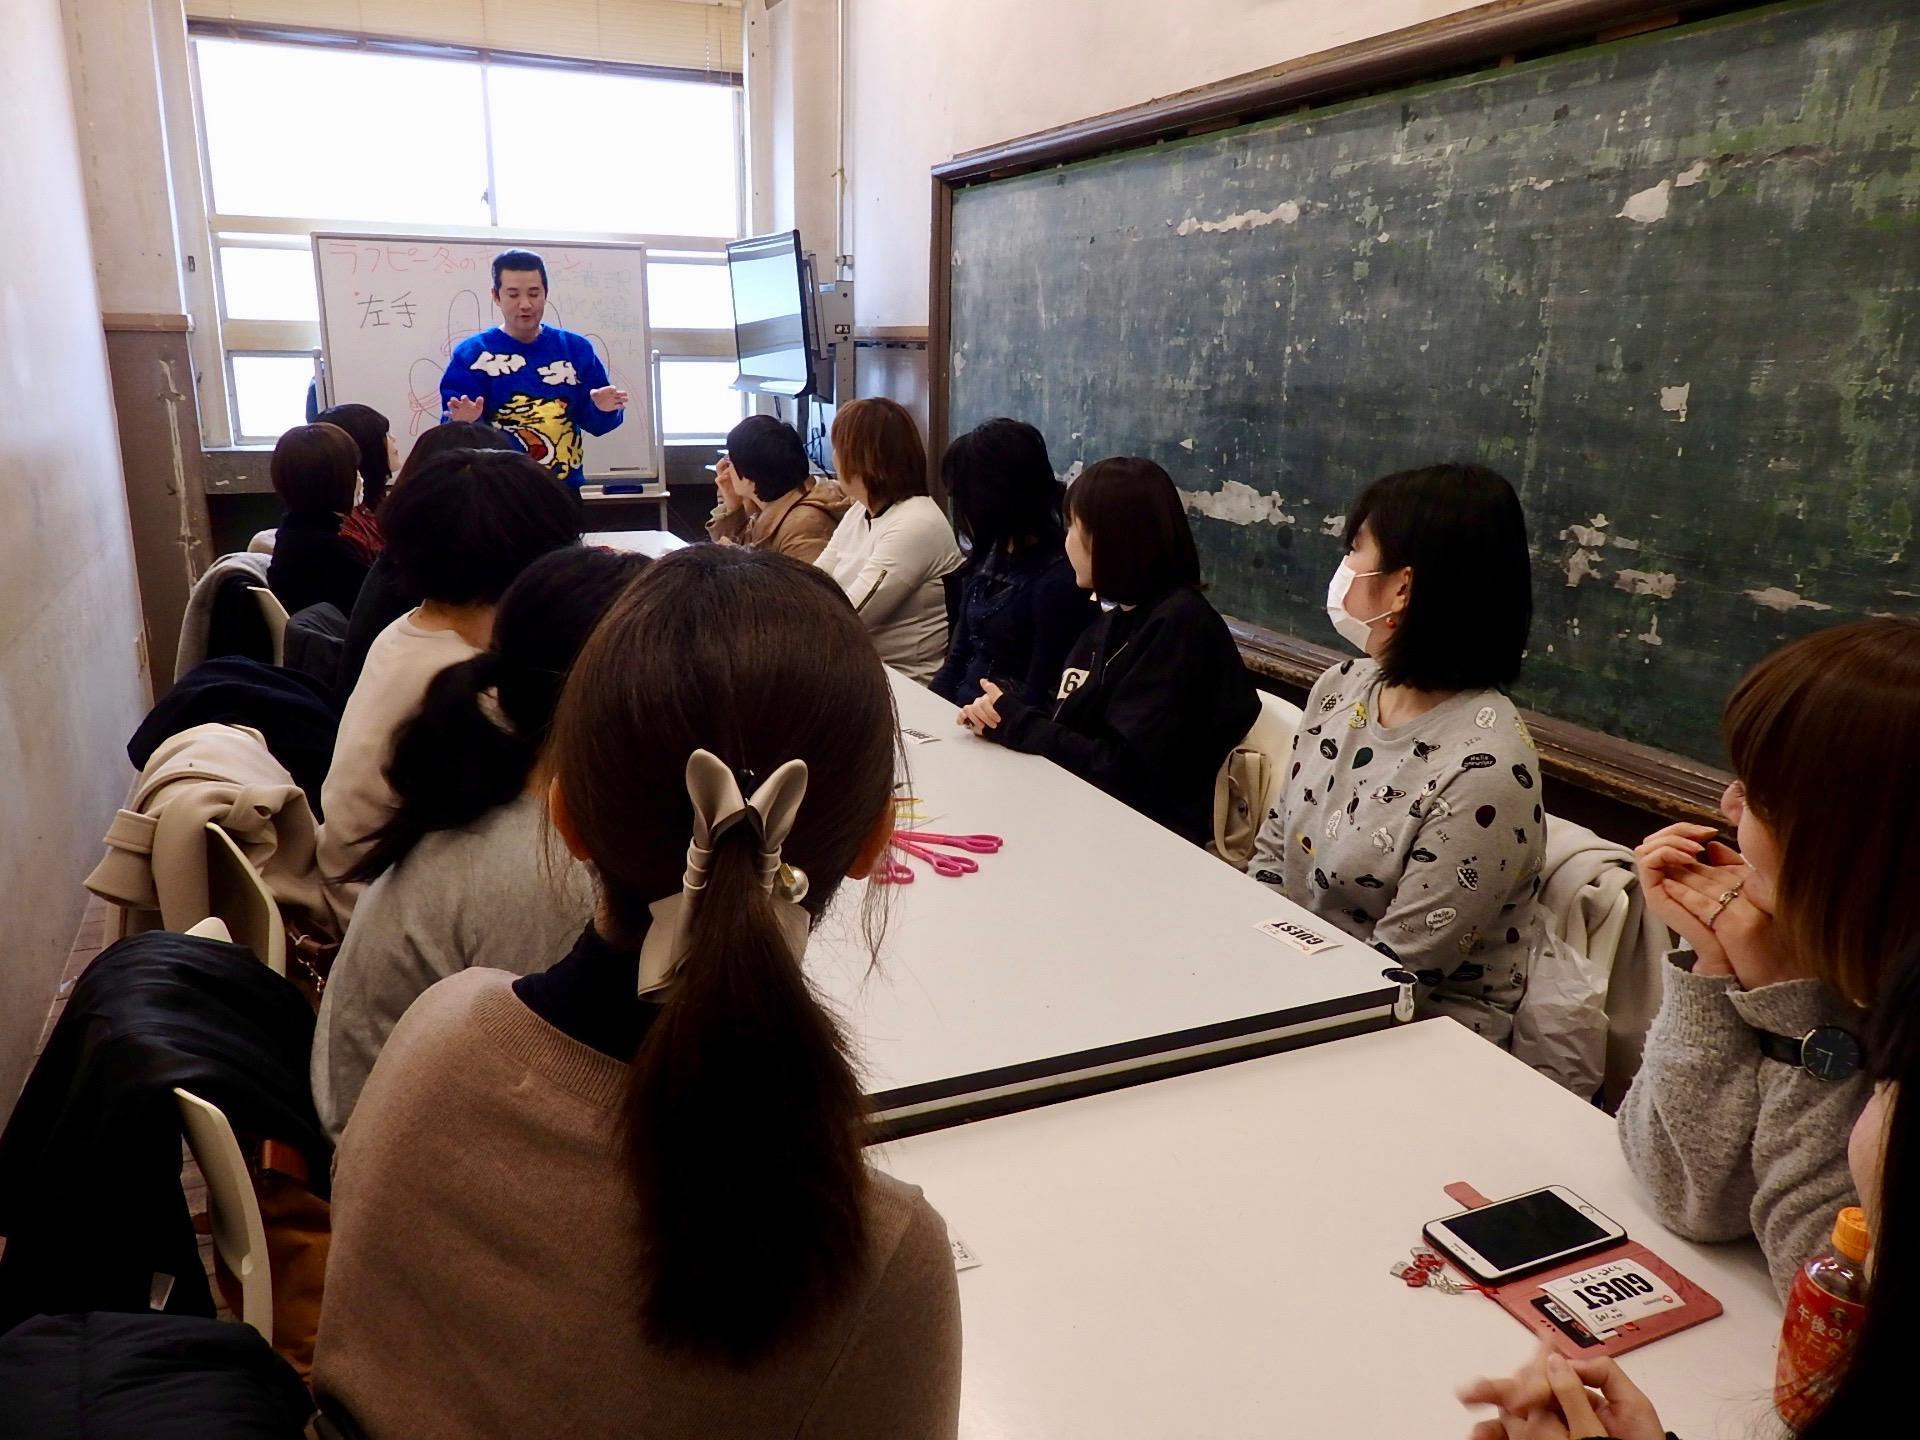 http://news.yoshimoto.co.jp/20180215065326-3e7c9adcc886ff228e7414004fde72f3658272c7.jpg